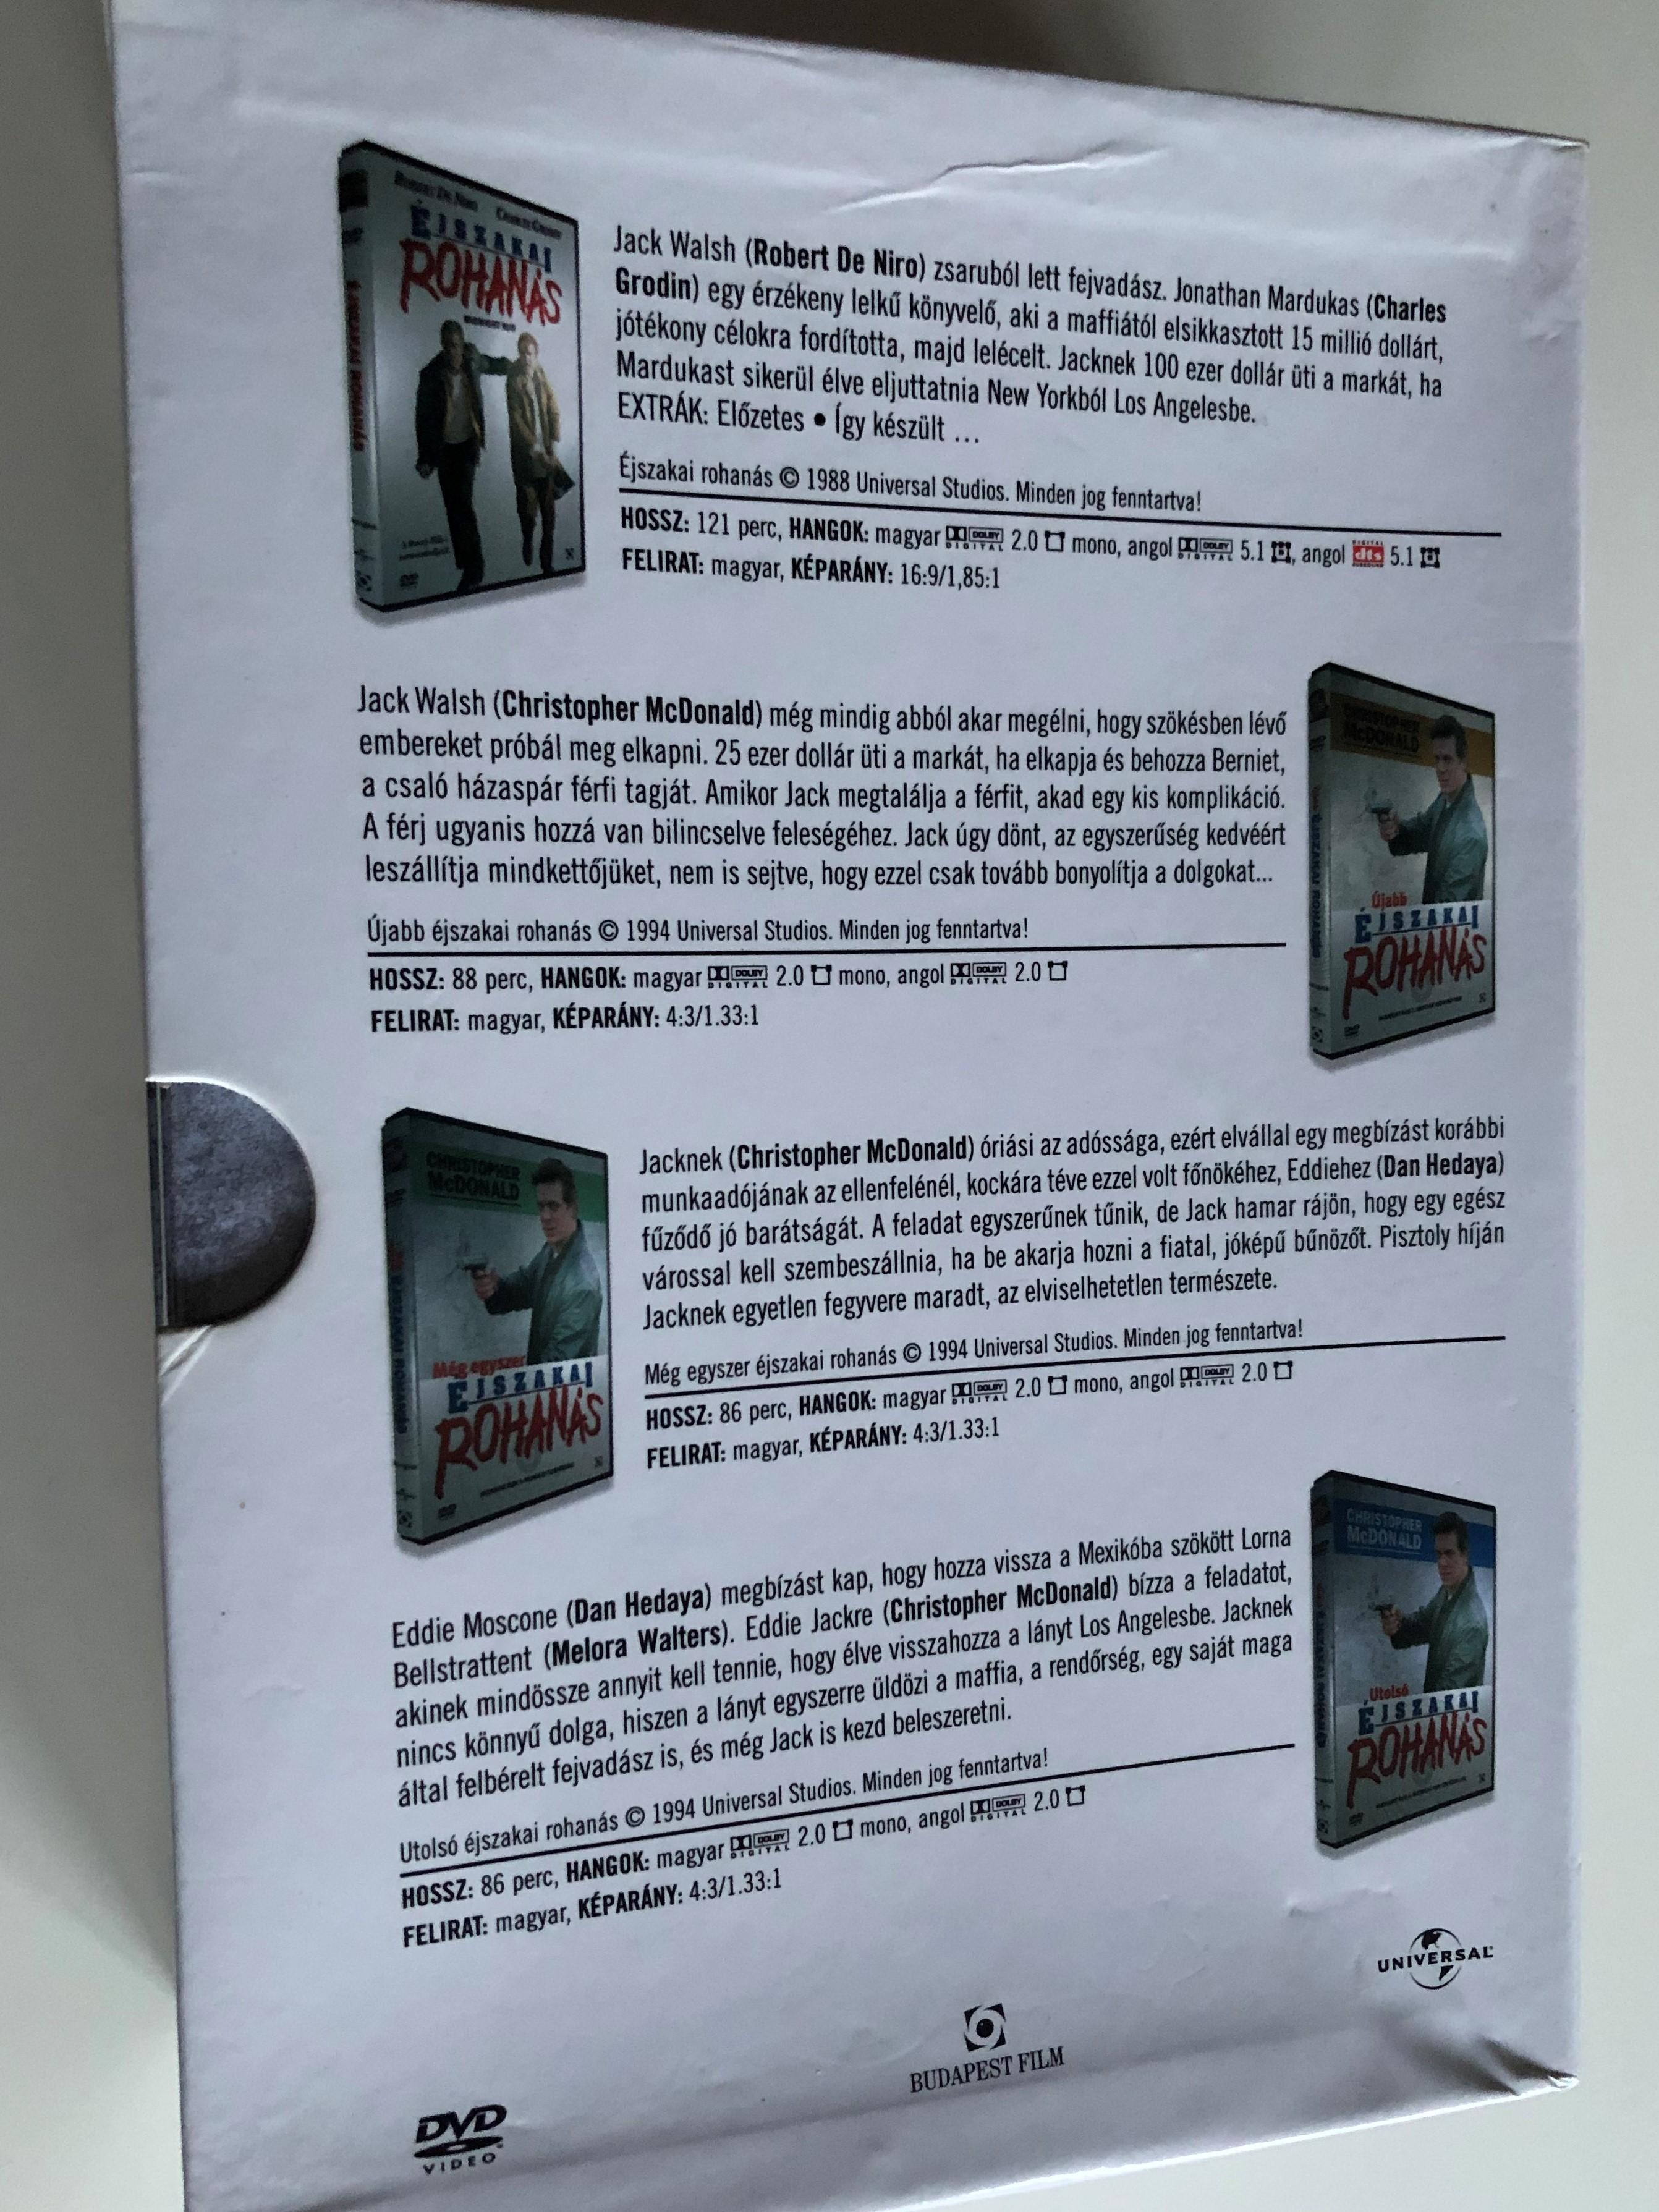 the-midnight-run-action-pack-dvd-set-1988-jszakai-rohan-s-a-gy-jtem-ny-4-dvd-3.jpg